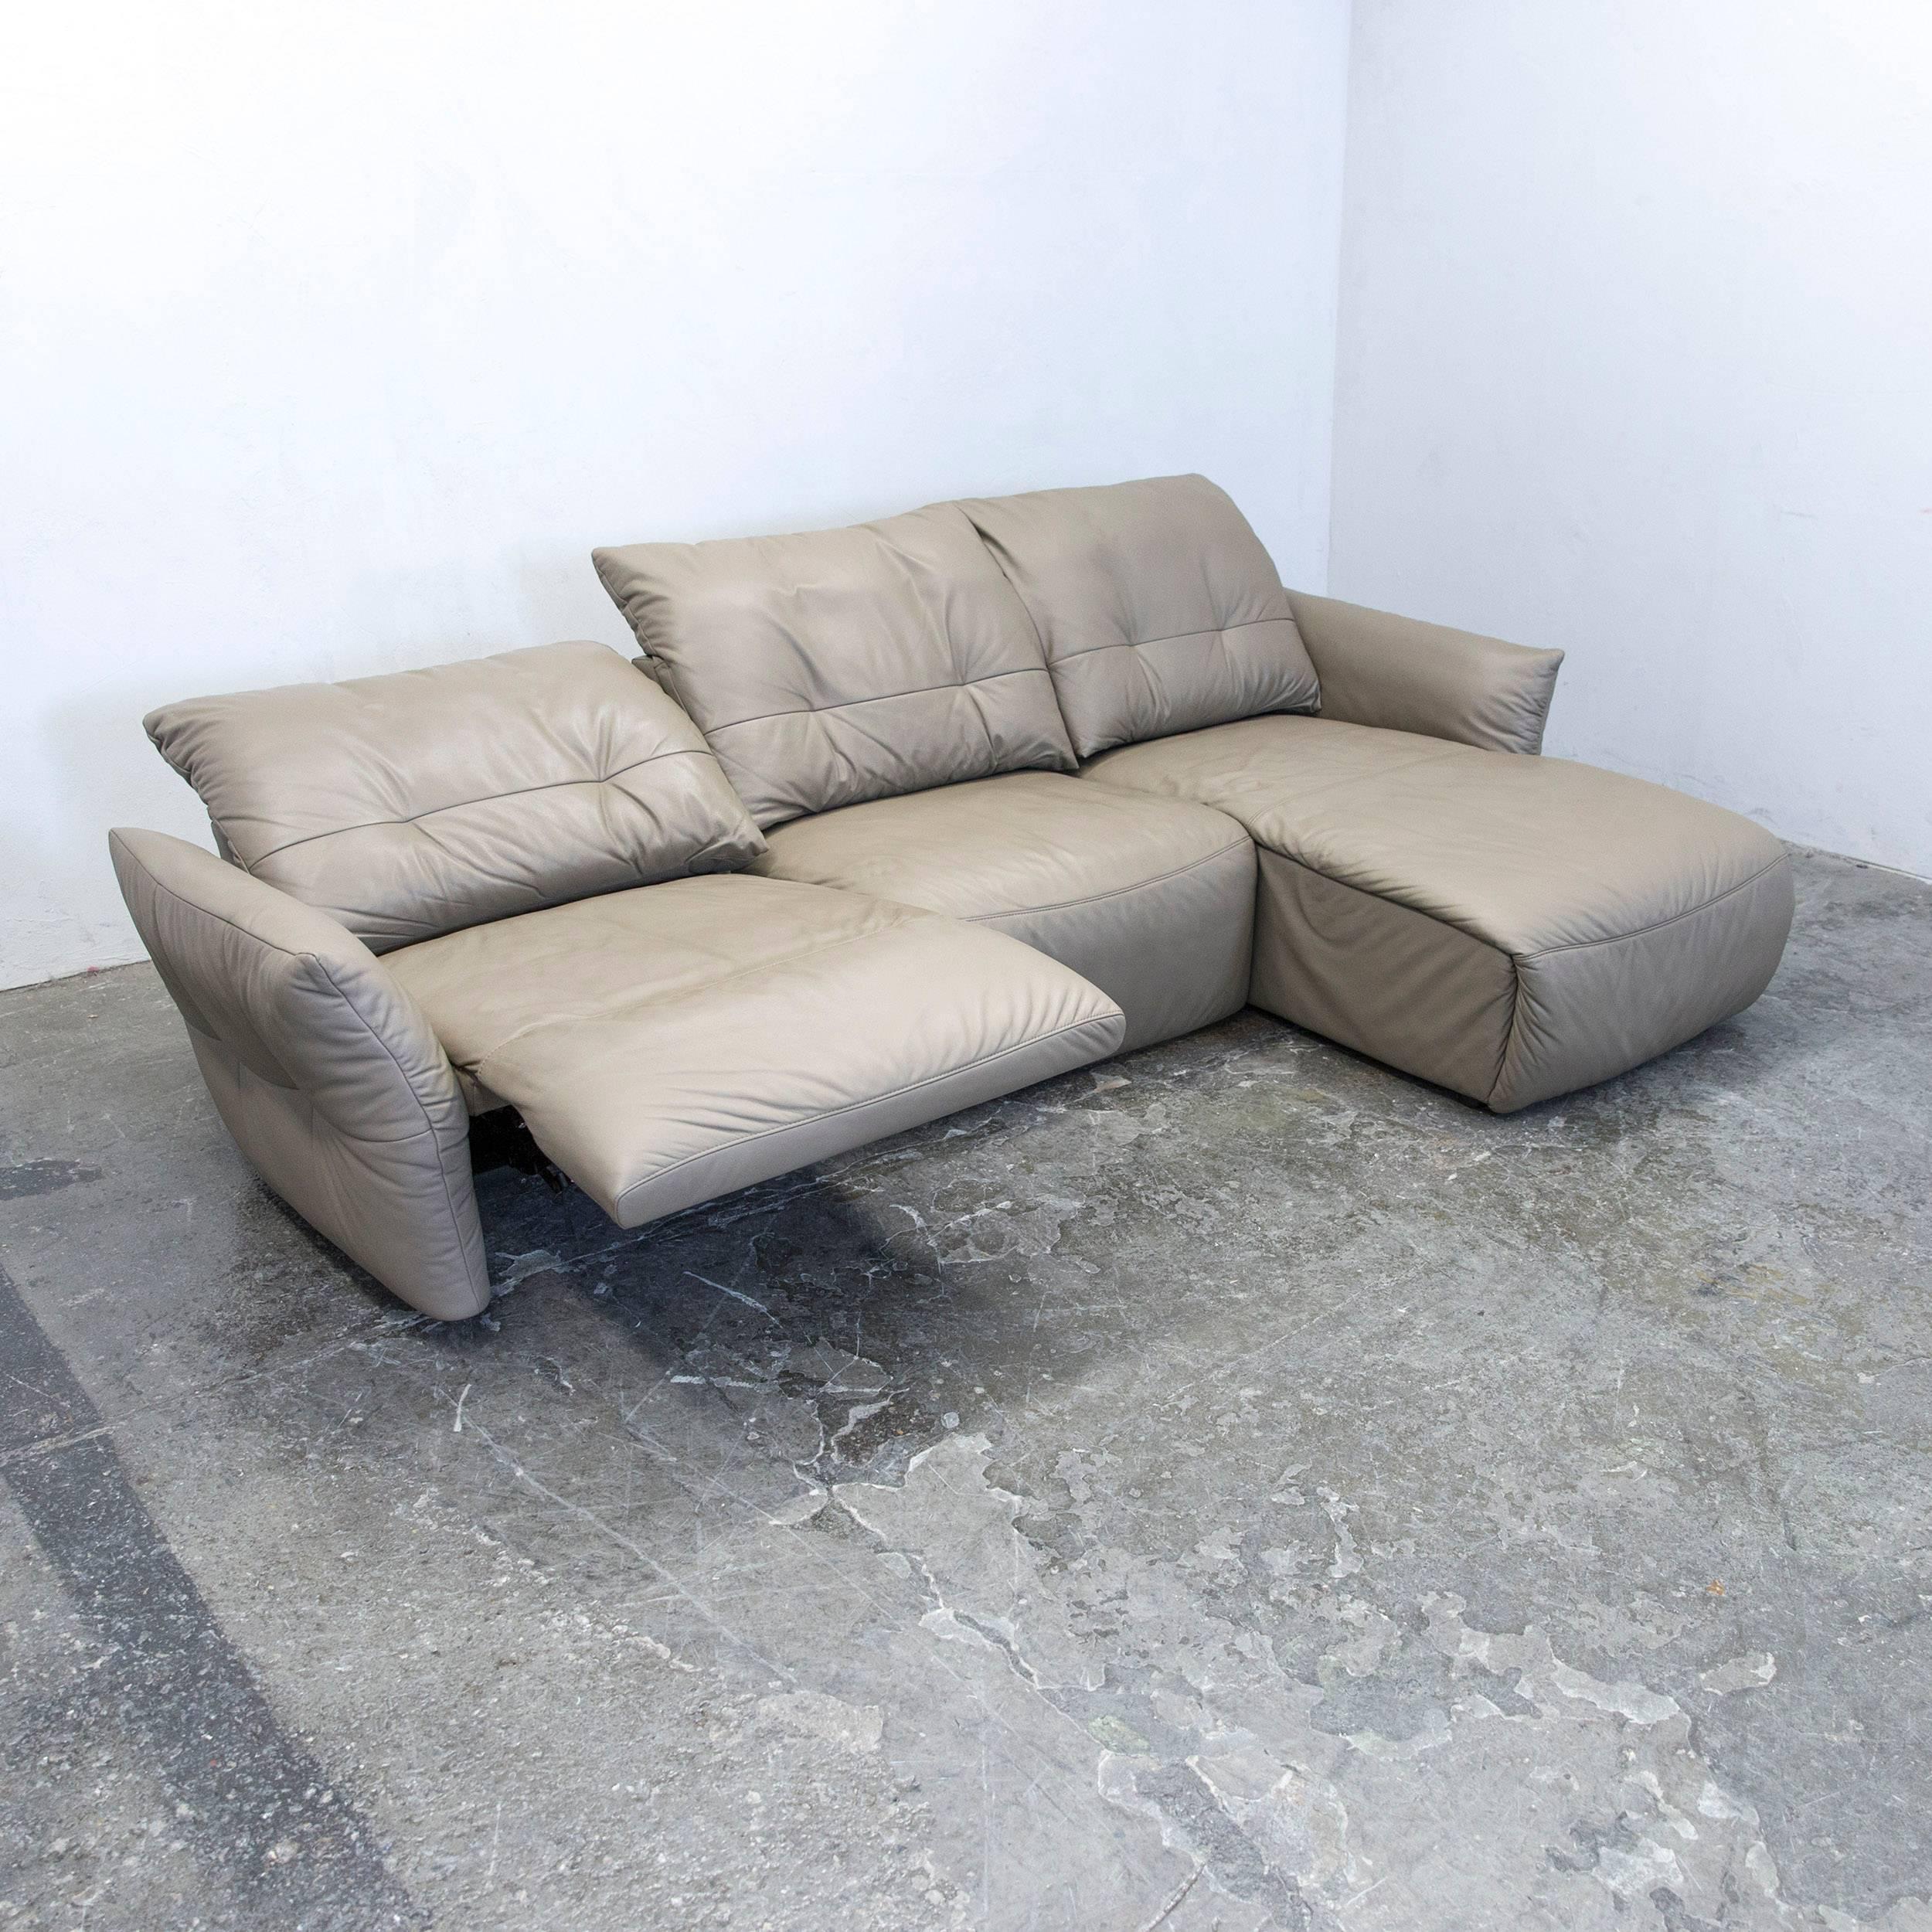 sofa kaufen leder amazing cool stressless sofa kaufen e relaxsofa ecke mit longseat leder. Black Bedroom Furniture Sets. Home Design Ideas